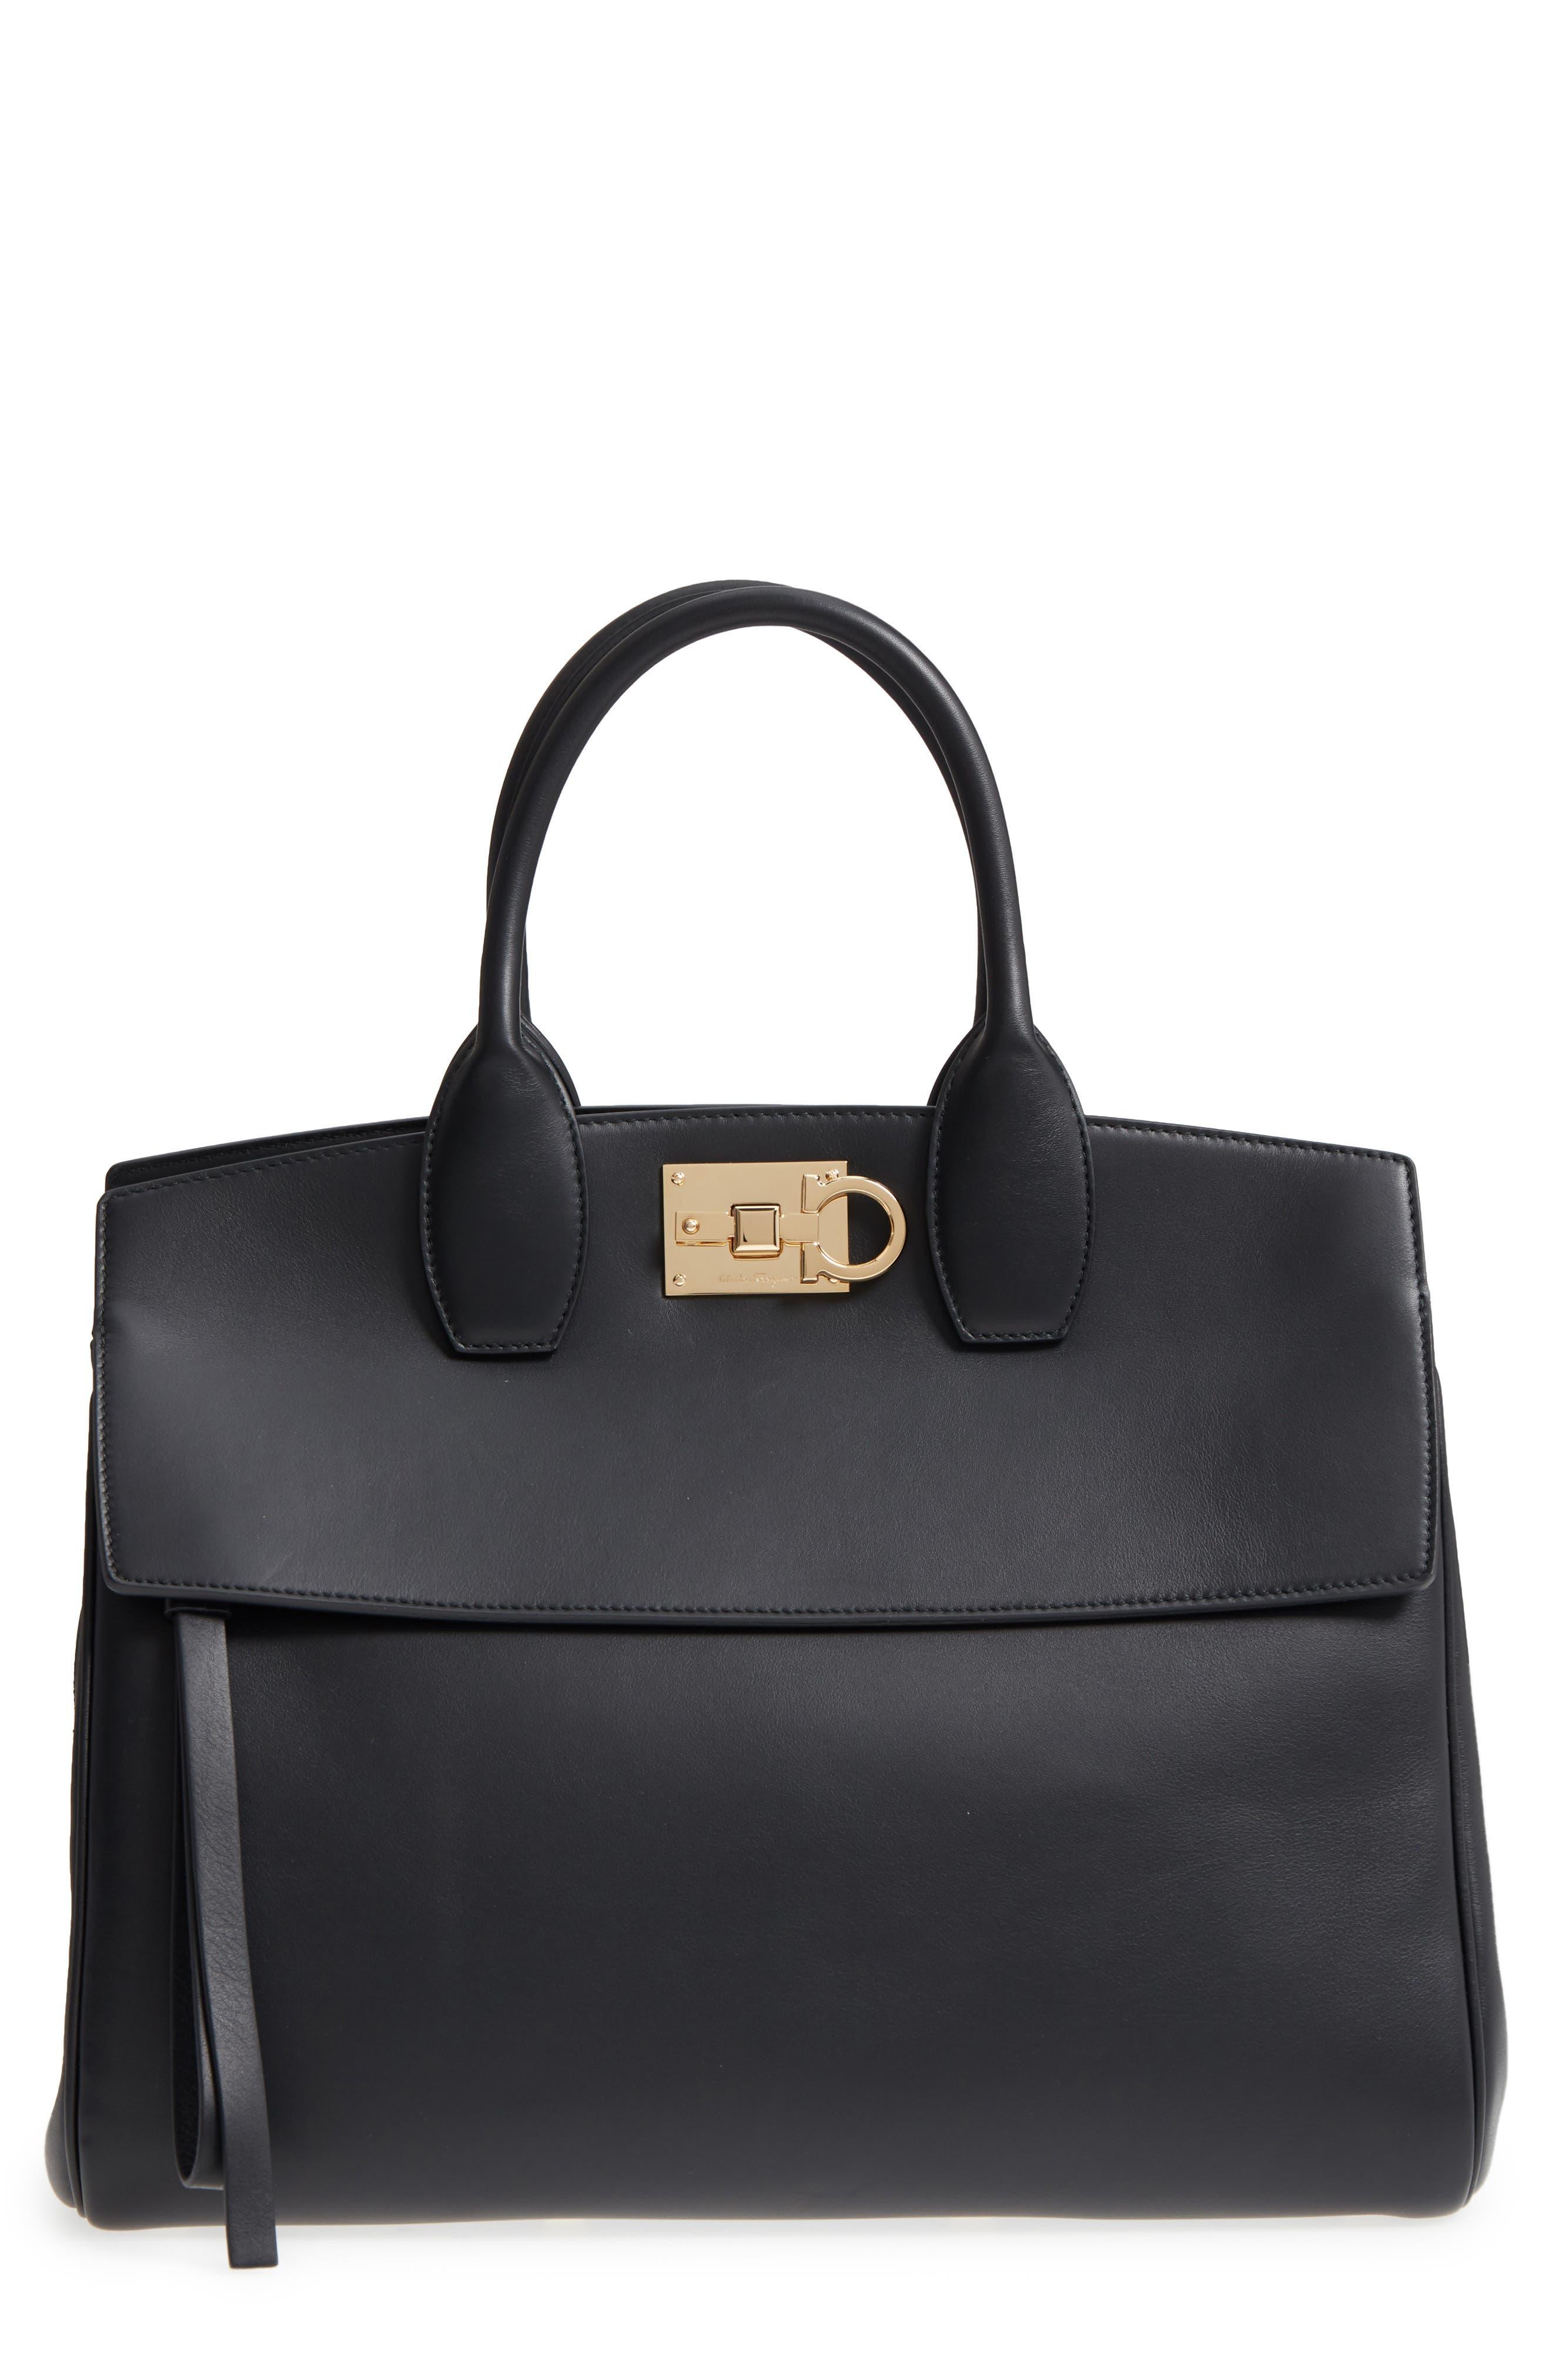 Salvatore Ferragamo Studio Calfskin Leather Top Handle Tote